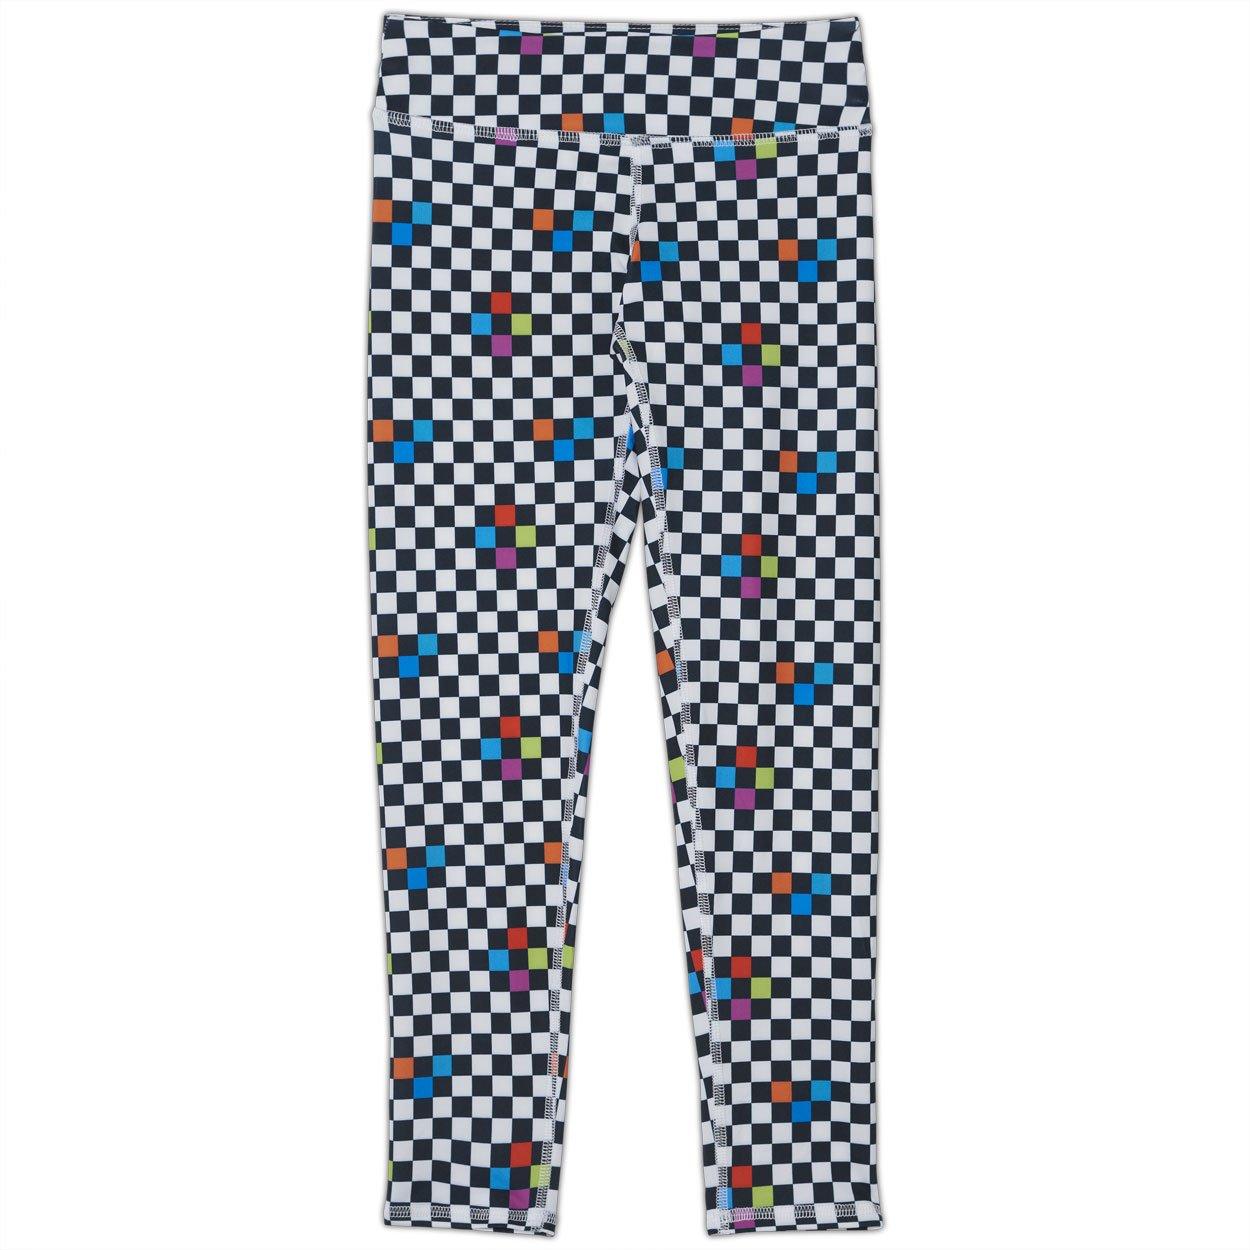 Checkerboard Hybrid Youth Leggings UPF 50+